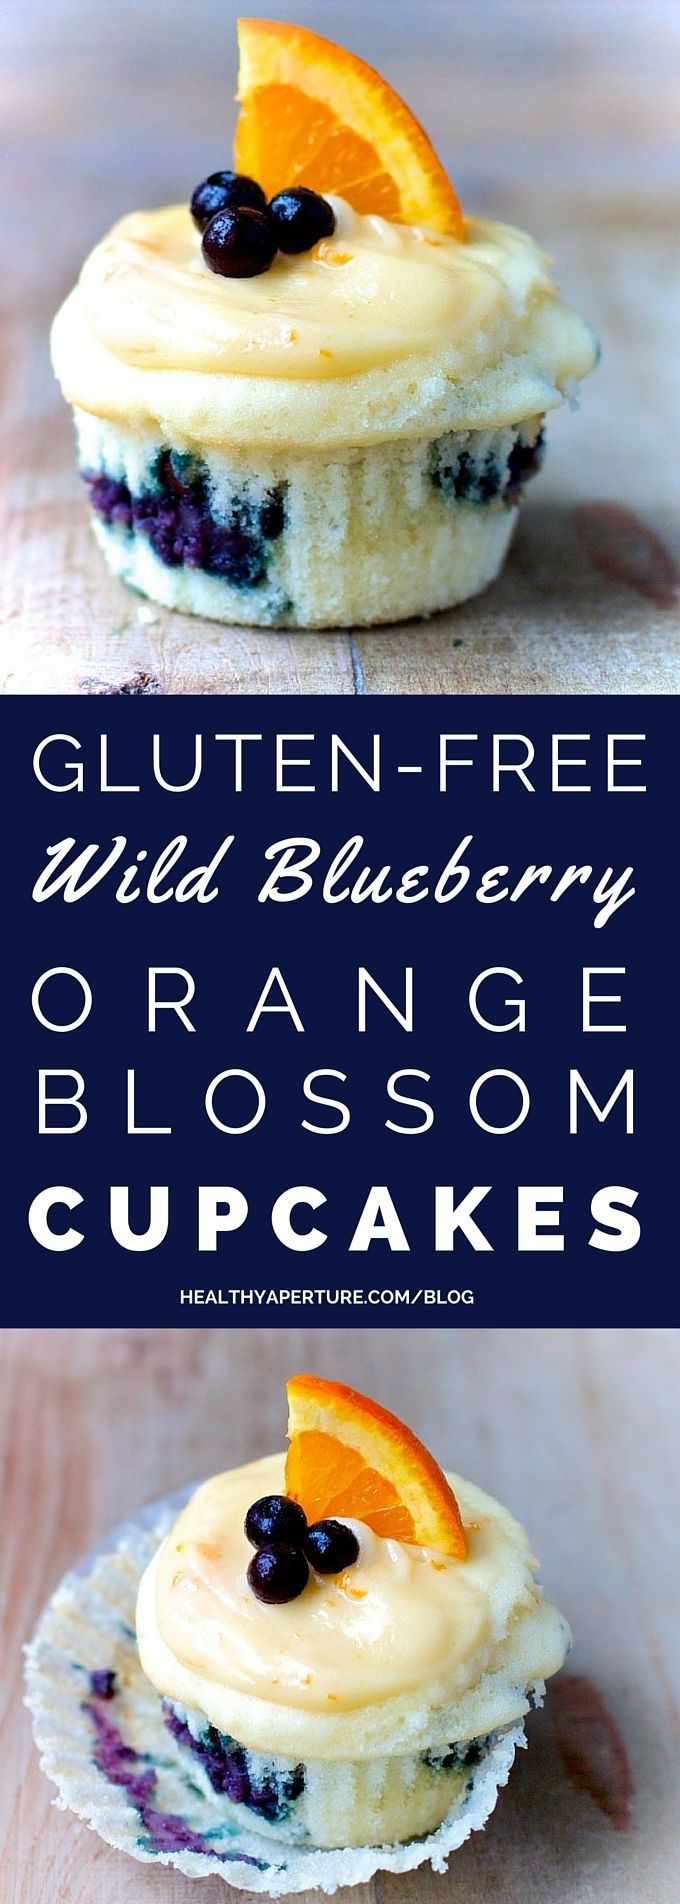 ... Food on Pinterest | Oreo cheesecake, Cheesecake and Banana coconut